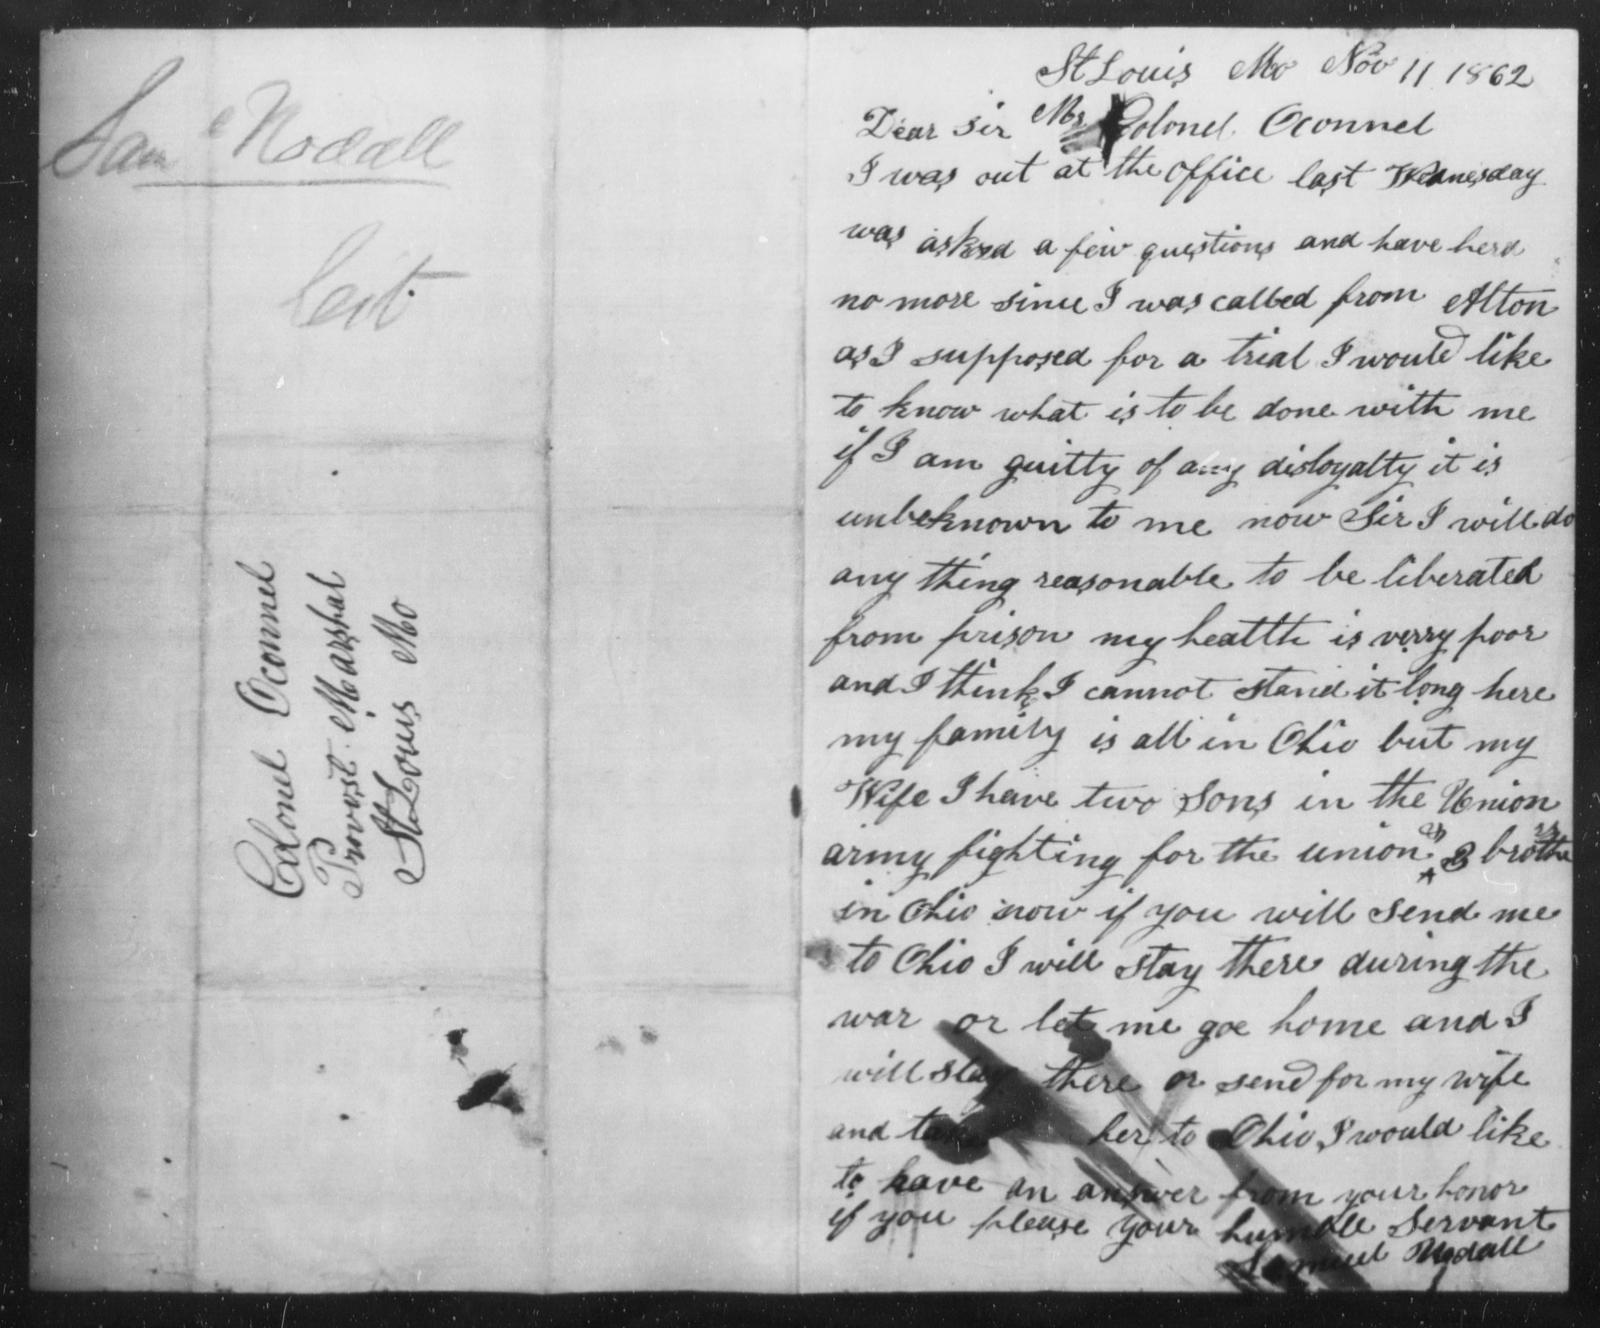 Noddll, Samuel - State: Missouri - Year: 1862